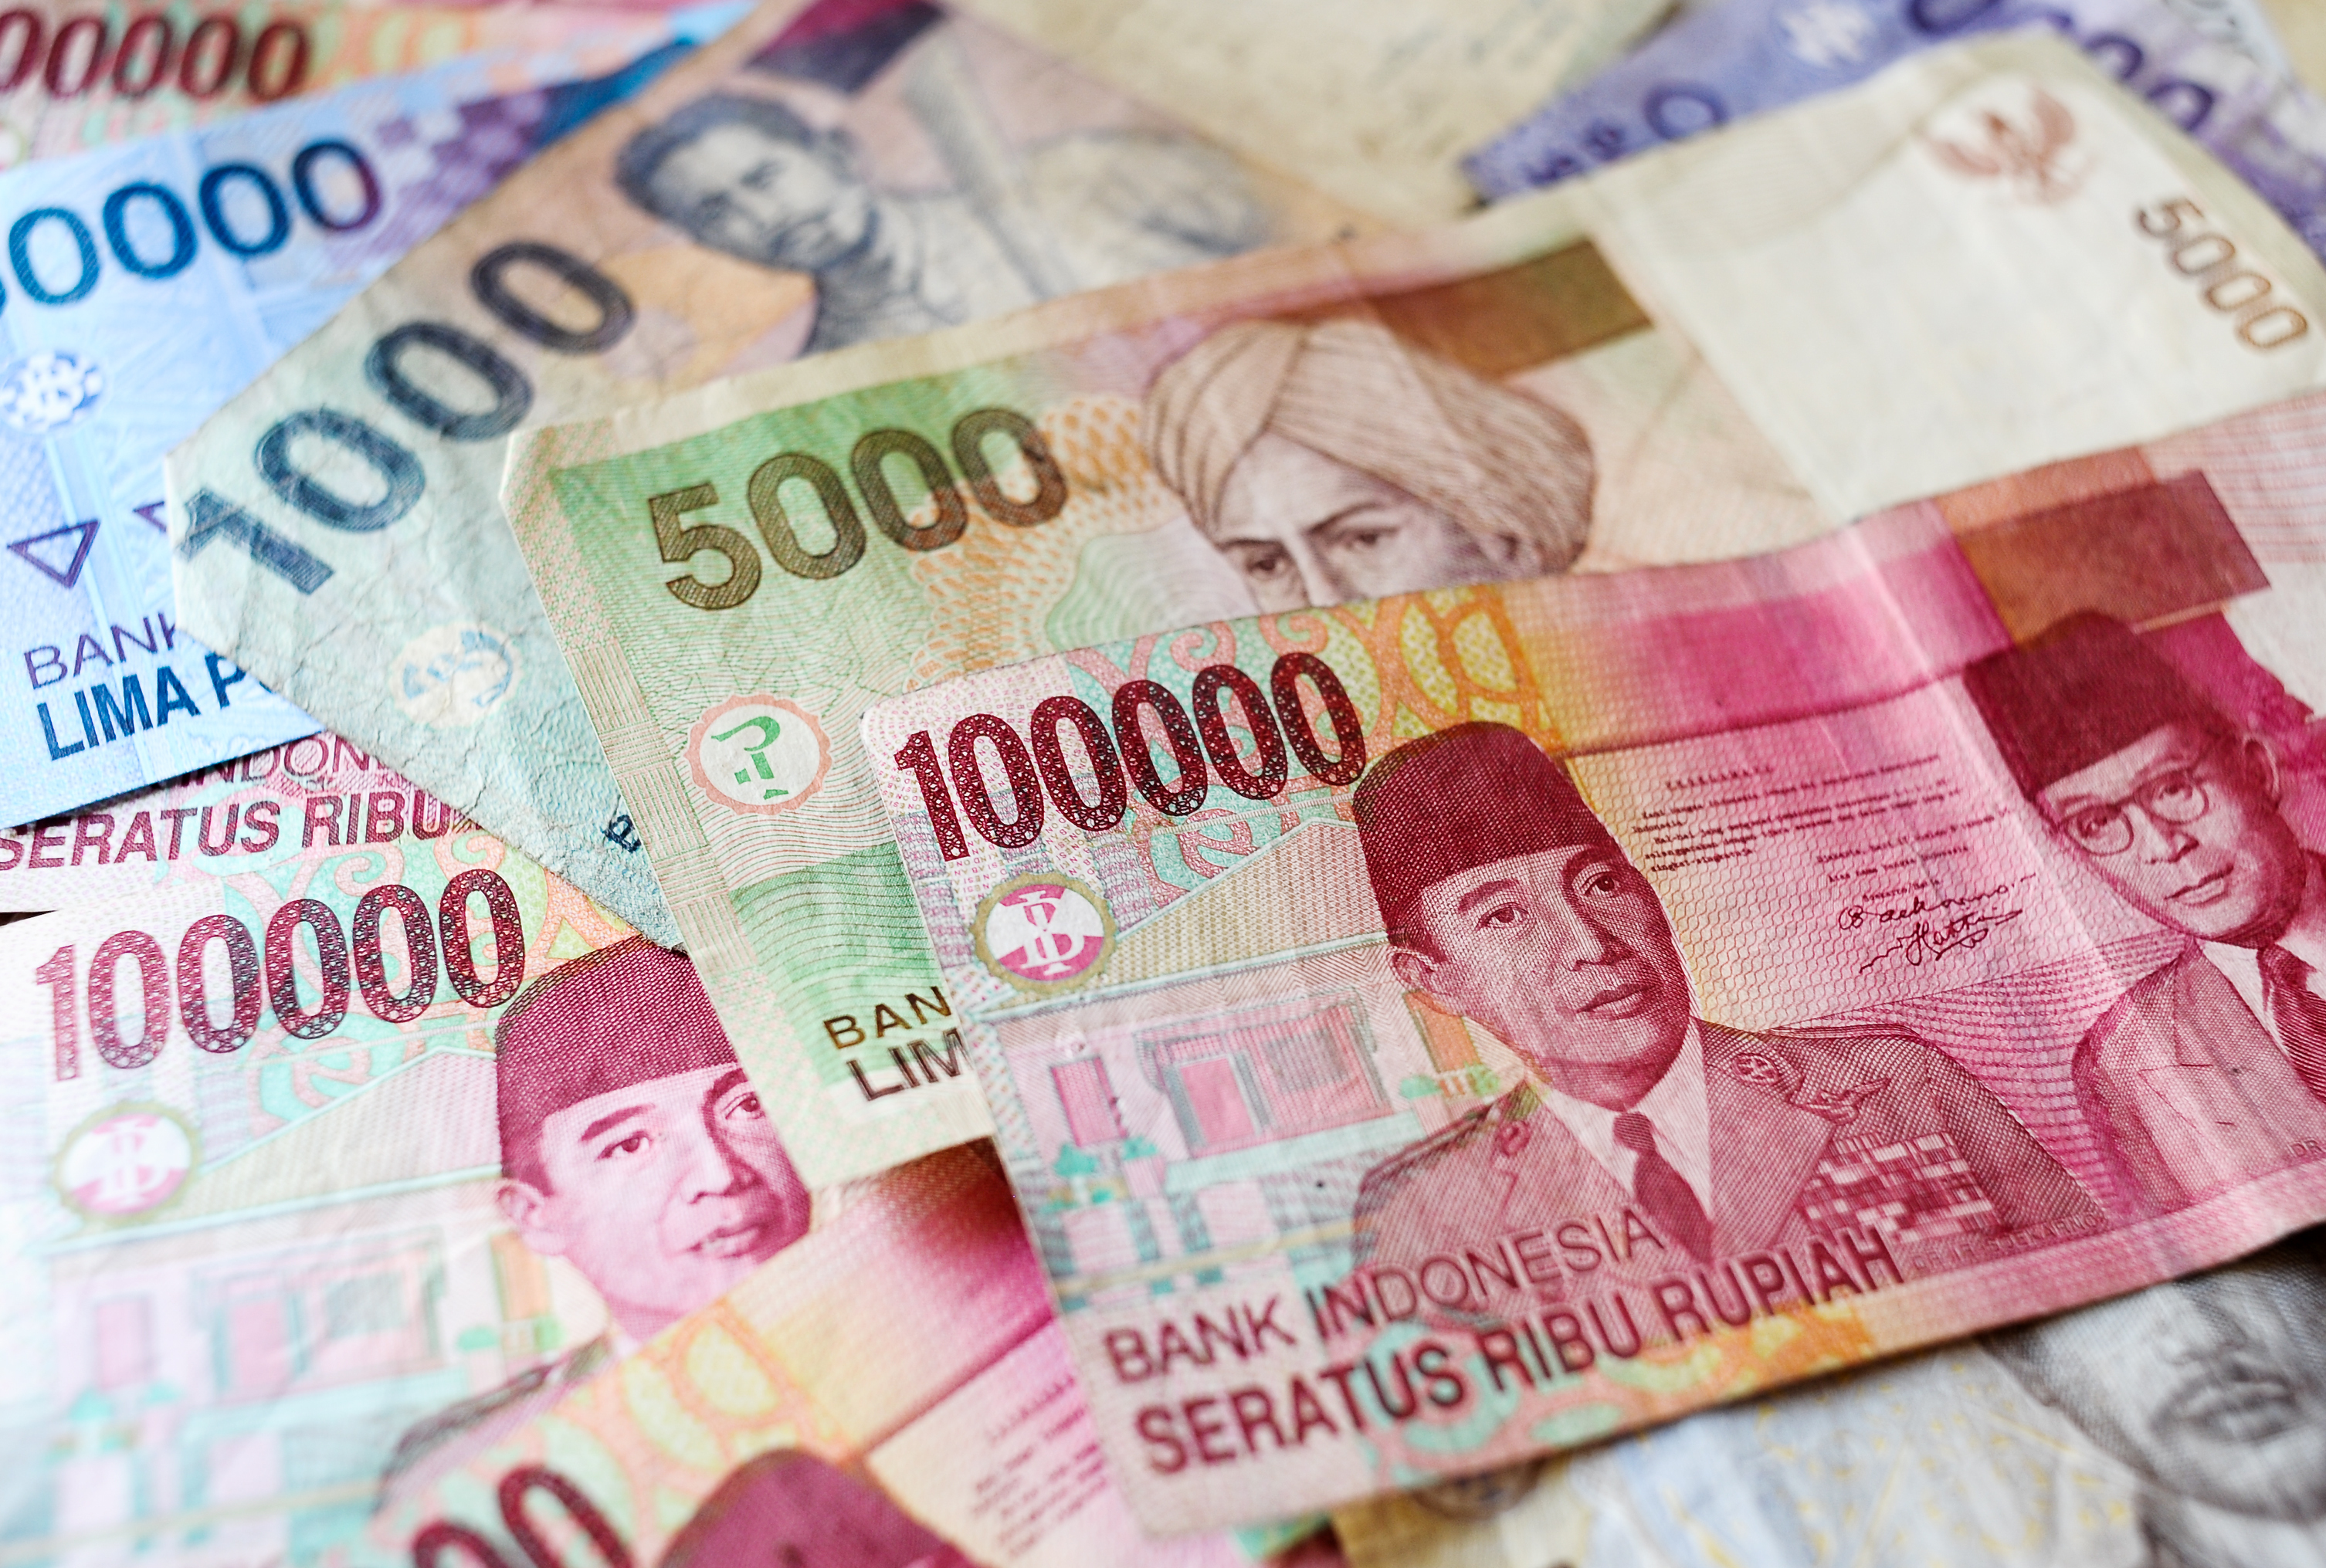 Indonesia's KoinWorks raises $12 million to grow its P2P SME lending